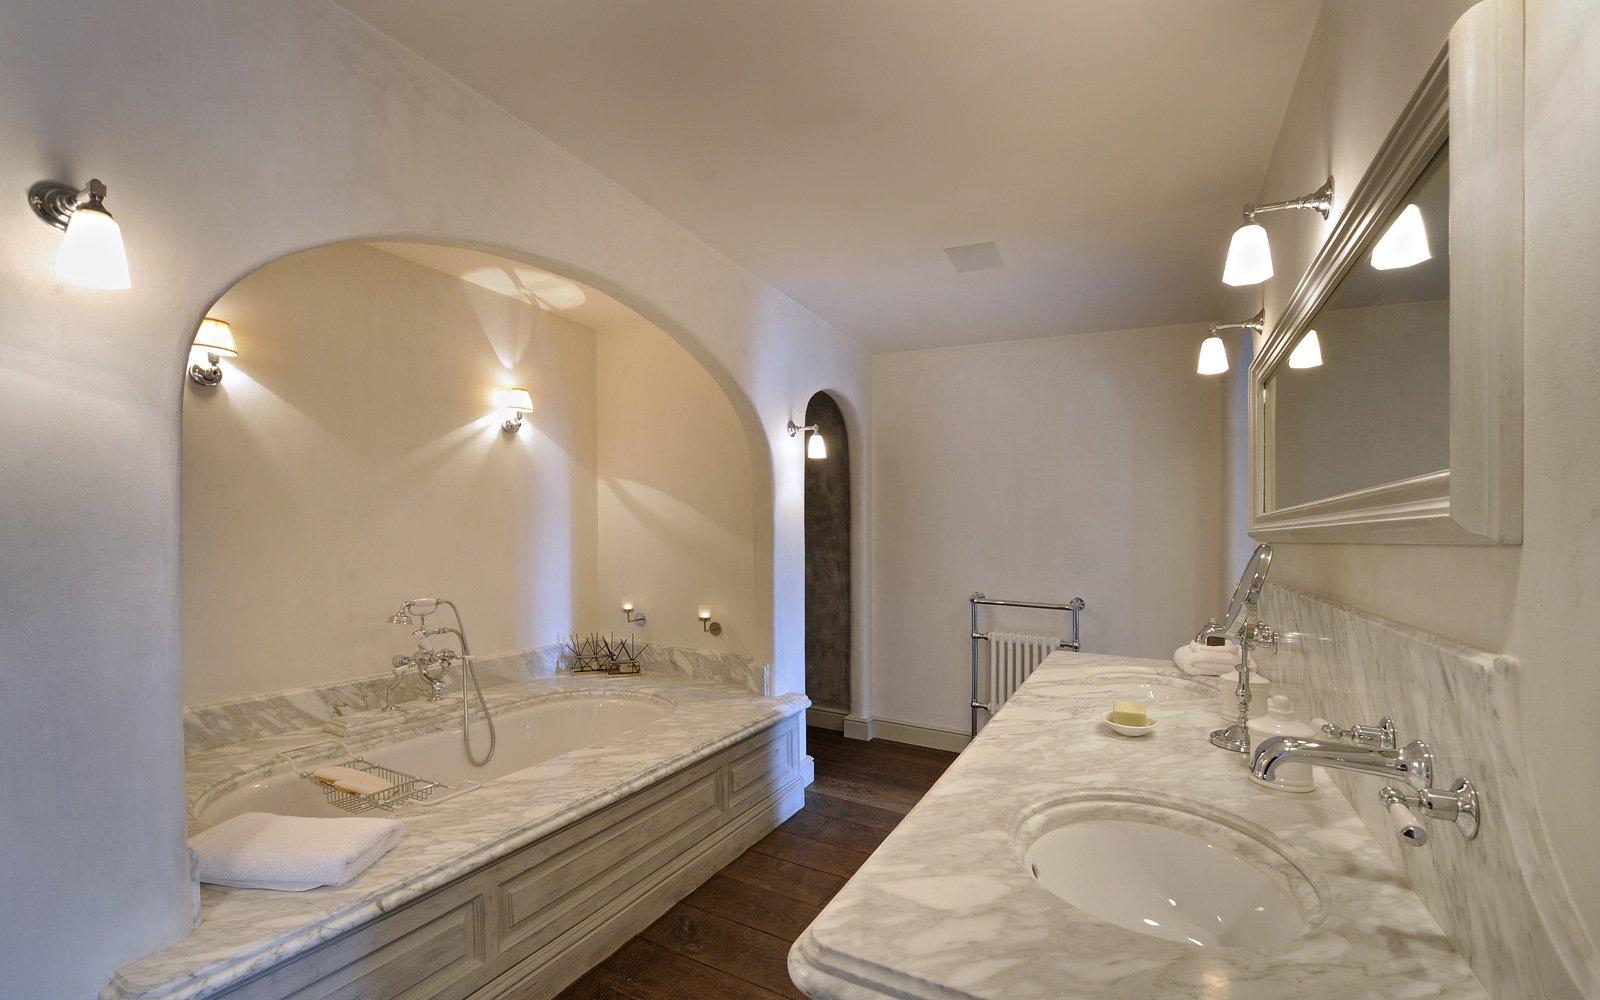 Badkamer, chique, wit marmer, wandkast, Italiaans marmer, inloopdouche, woonhuis als showroom, dauby